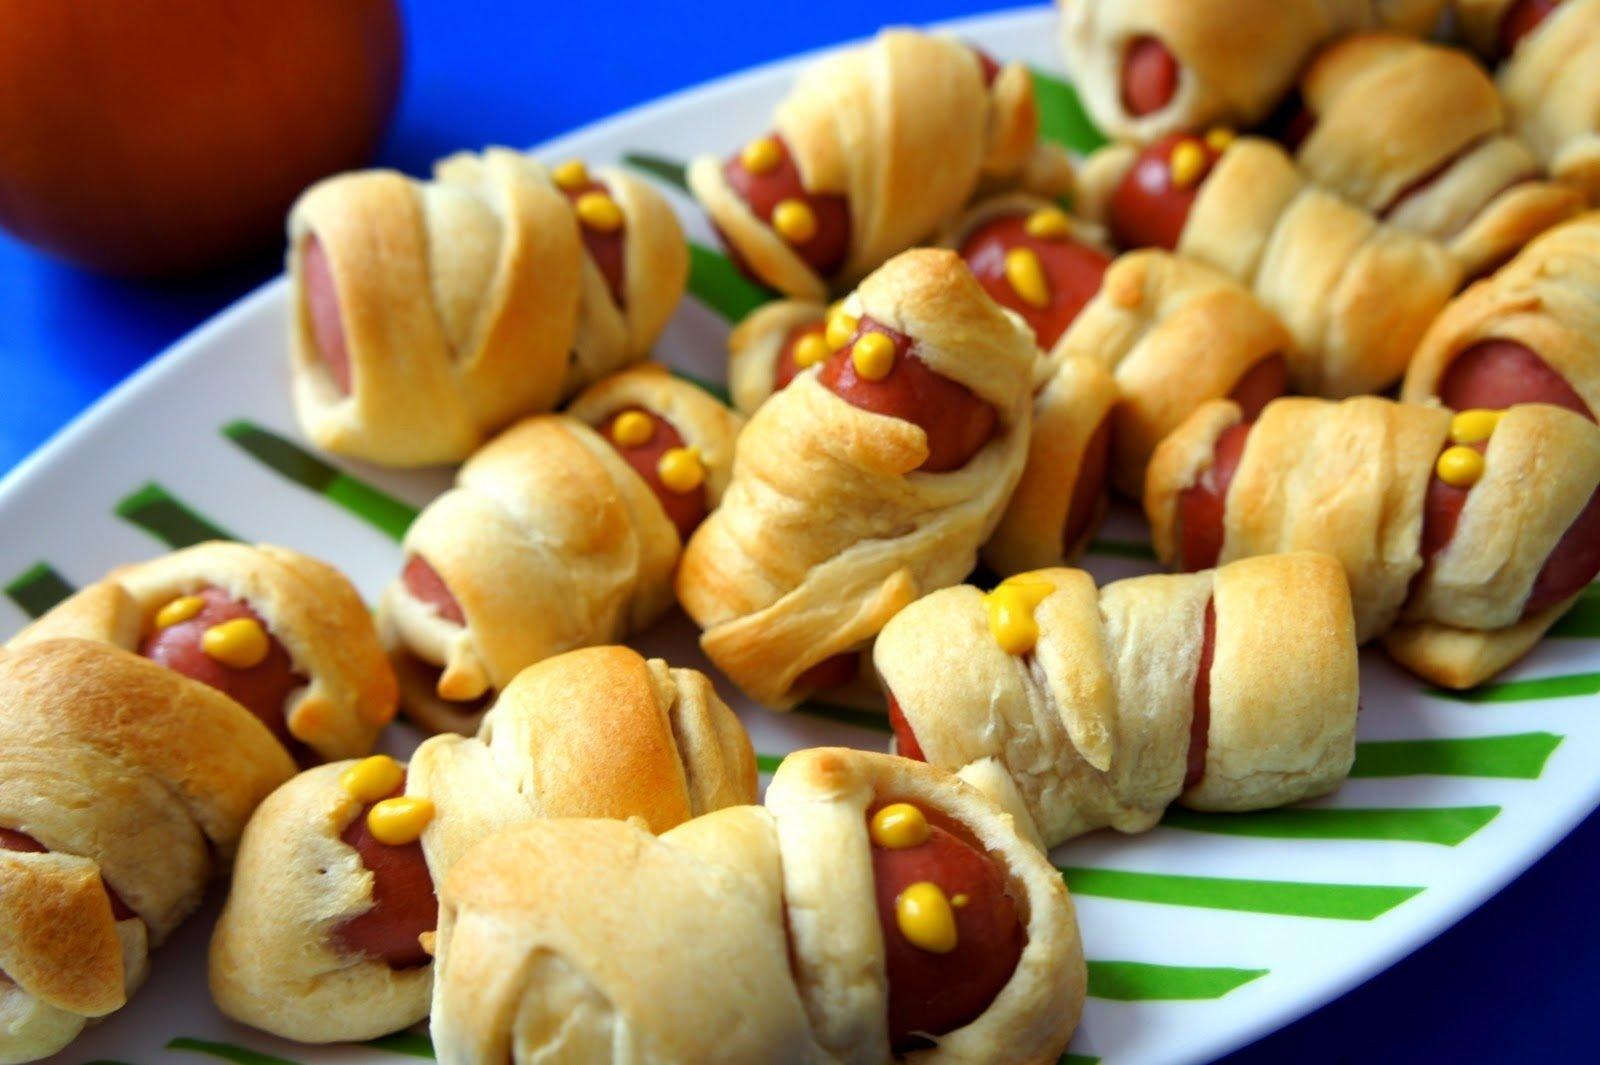 10 Awesome Halloween Baking Ideas For Kids halloween party food ideas children halloween articles halloween 3 2021